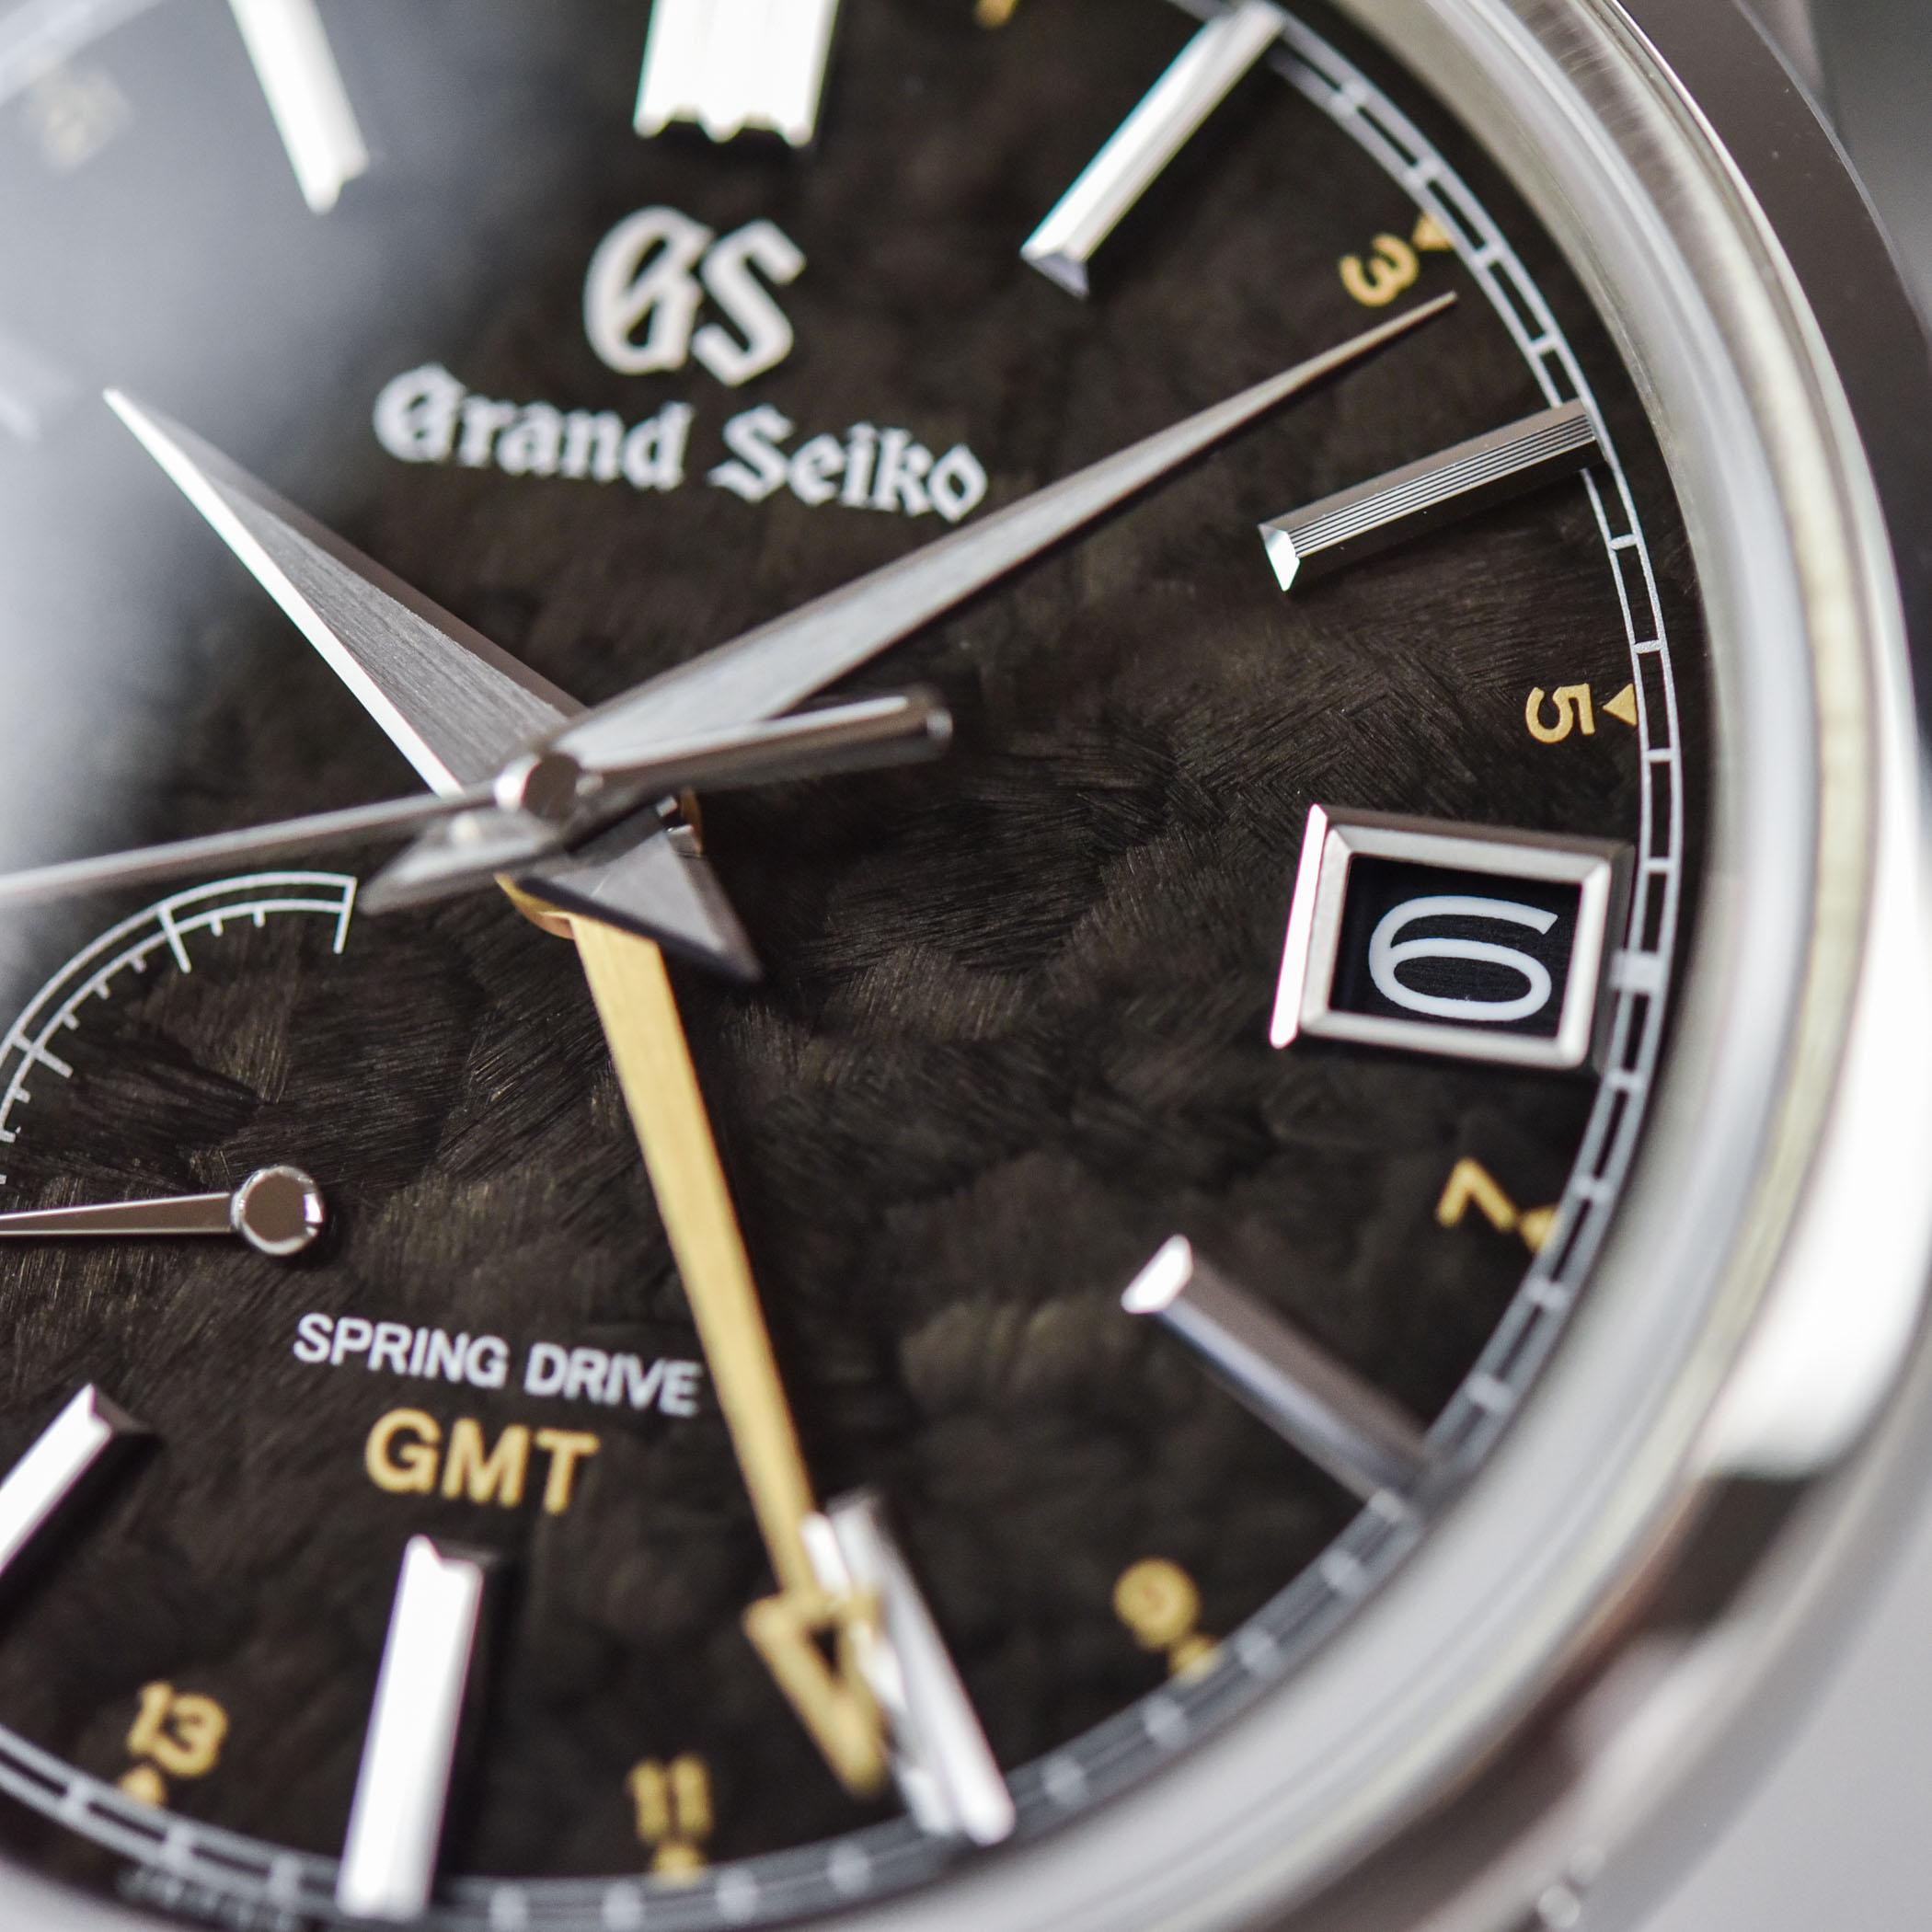 Grand Seiko Elegance GMT Spring Drive 4 seasons collection SBGE271